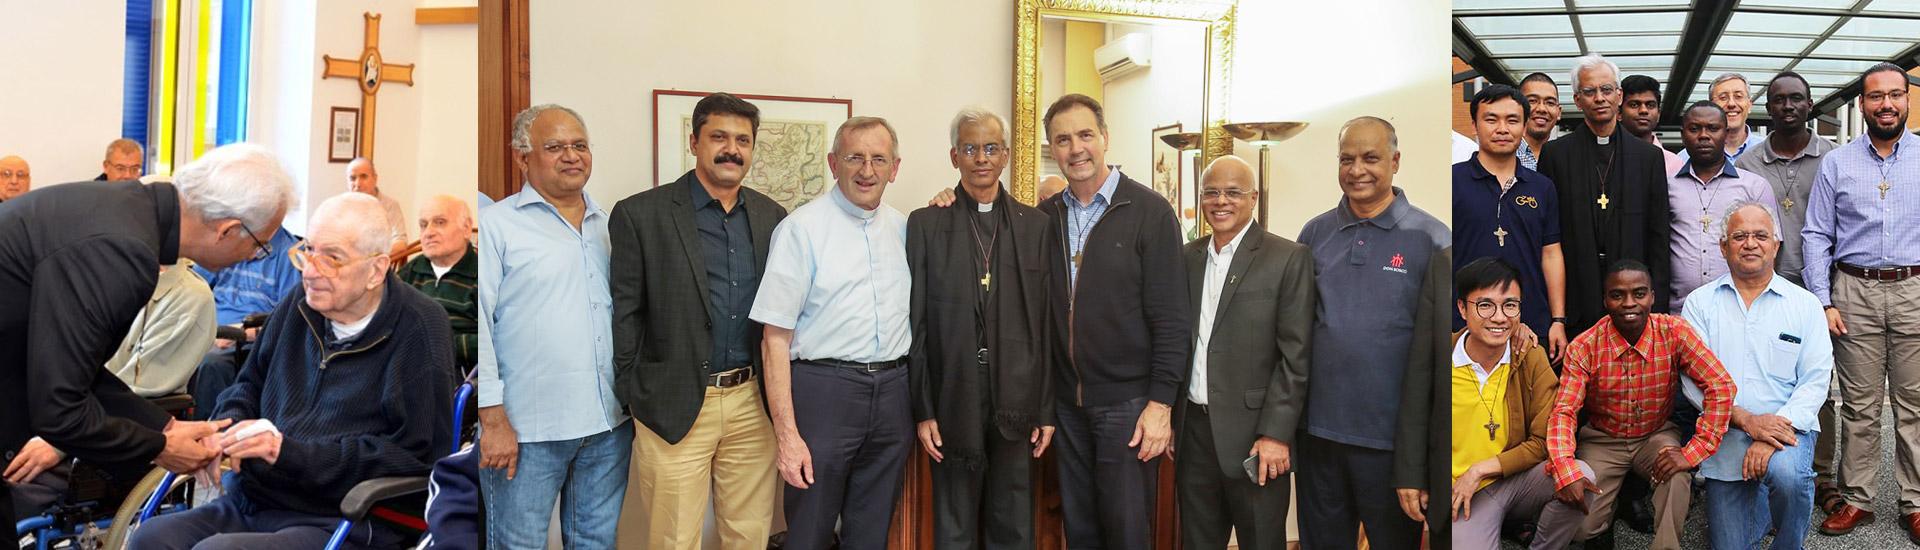 El misionero Tom Uzhunnalil regresa a India